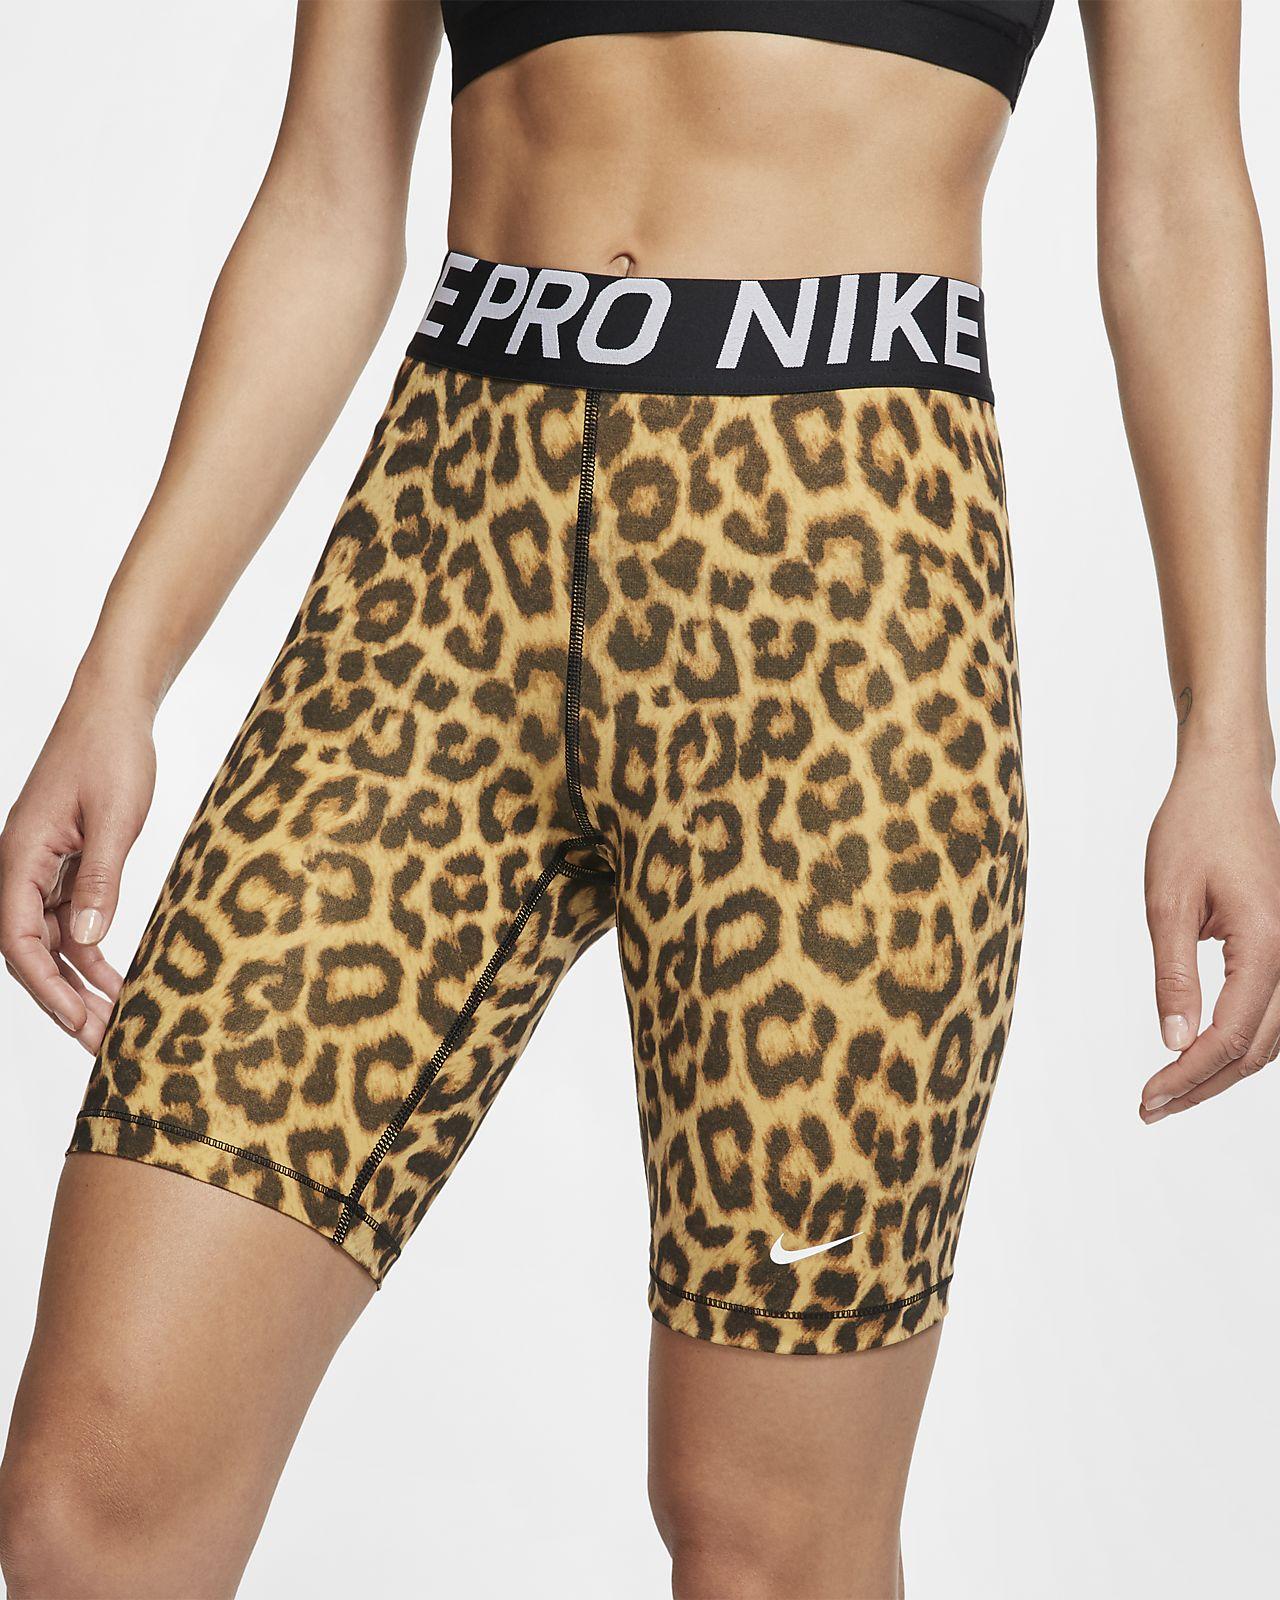 Nike Pro Damenshorts mit Print (ca. 20 cm)